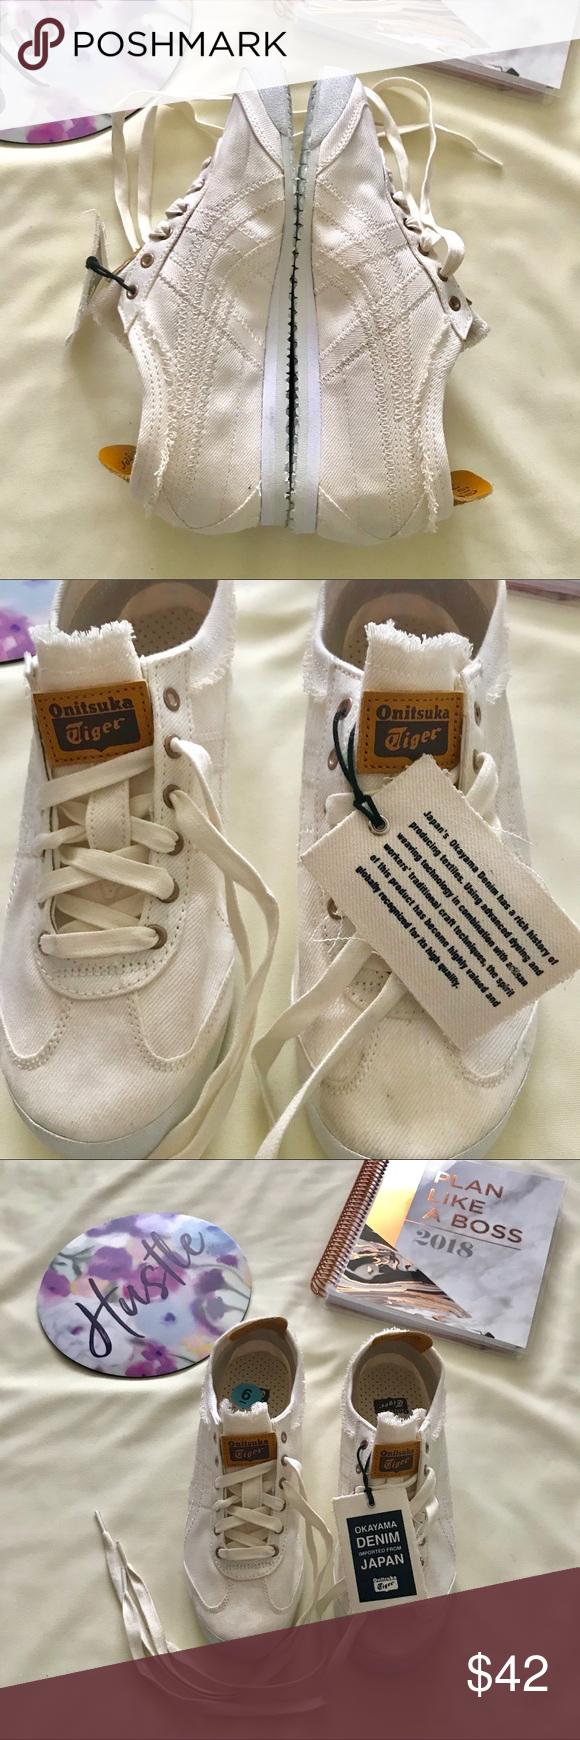 sale retailer d66d1 baffd NWOB] Asics (Size 6) Onitsuka Tiger Denim Shoes This item is ...